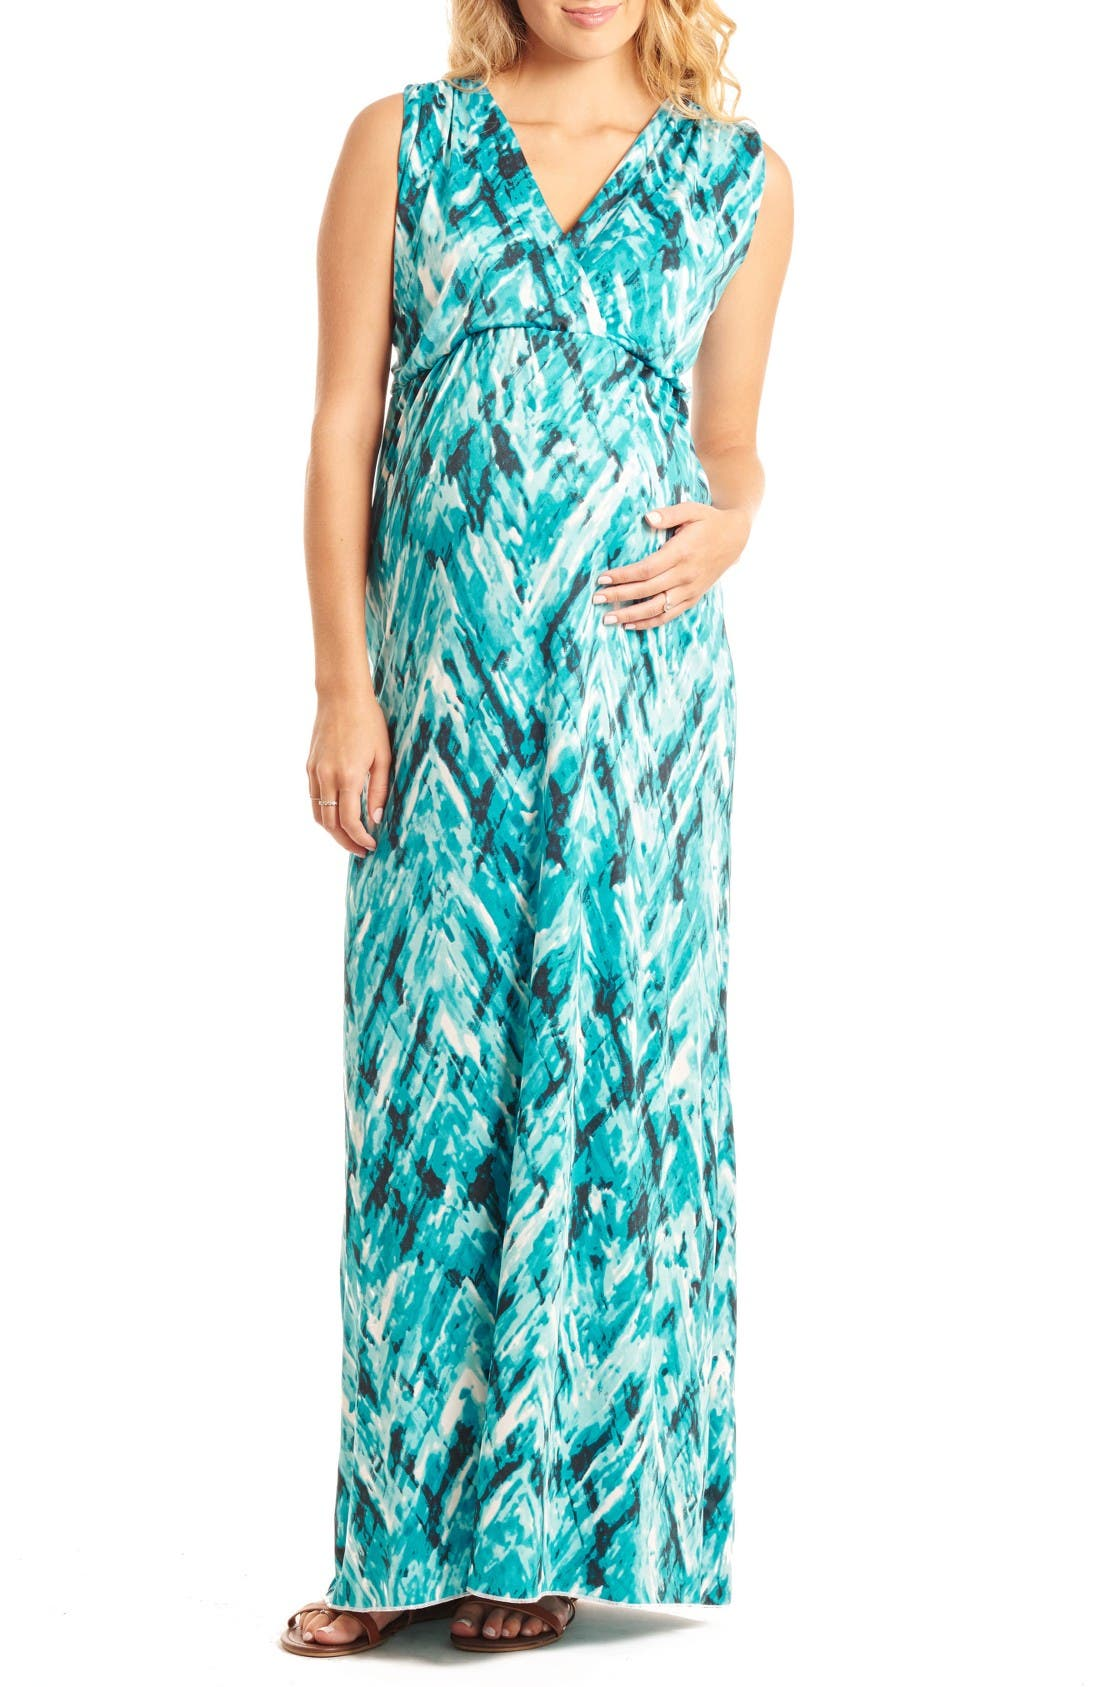 EVERLY GREY Jill Maternity Maxi Dress